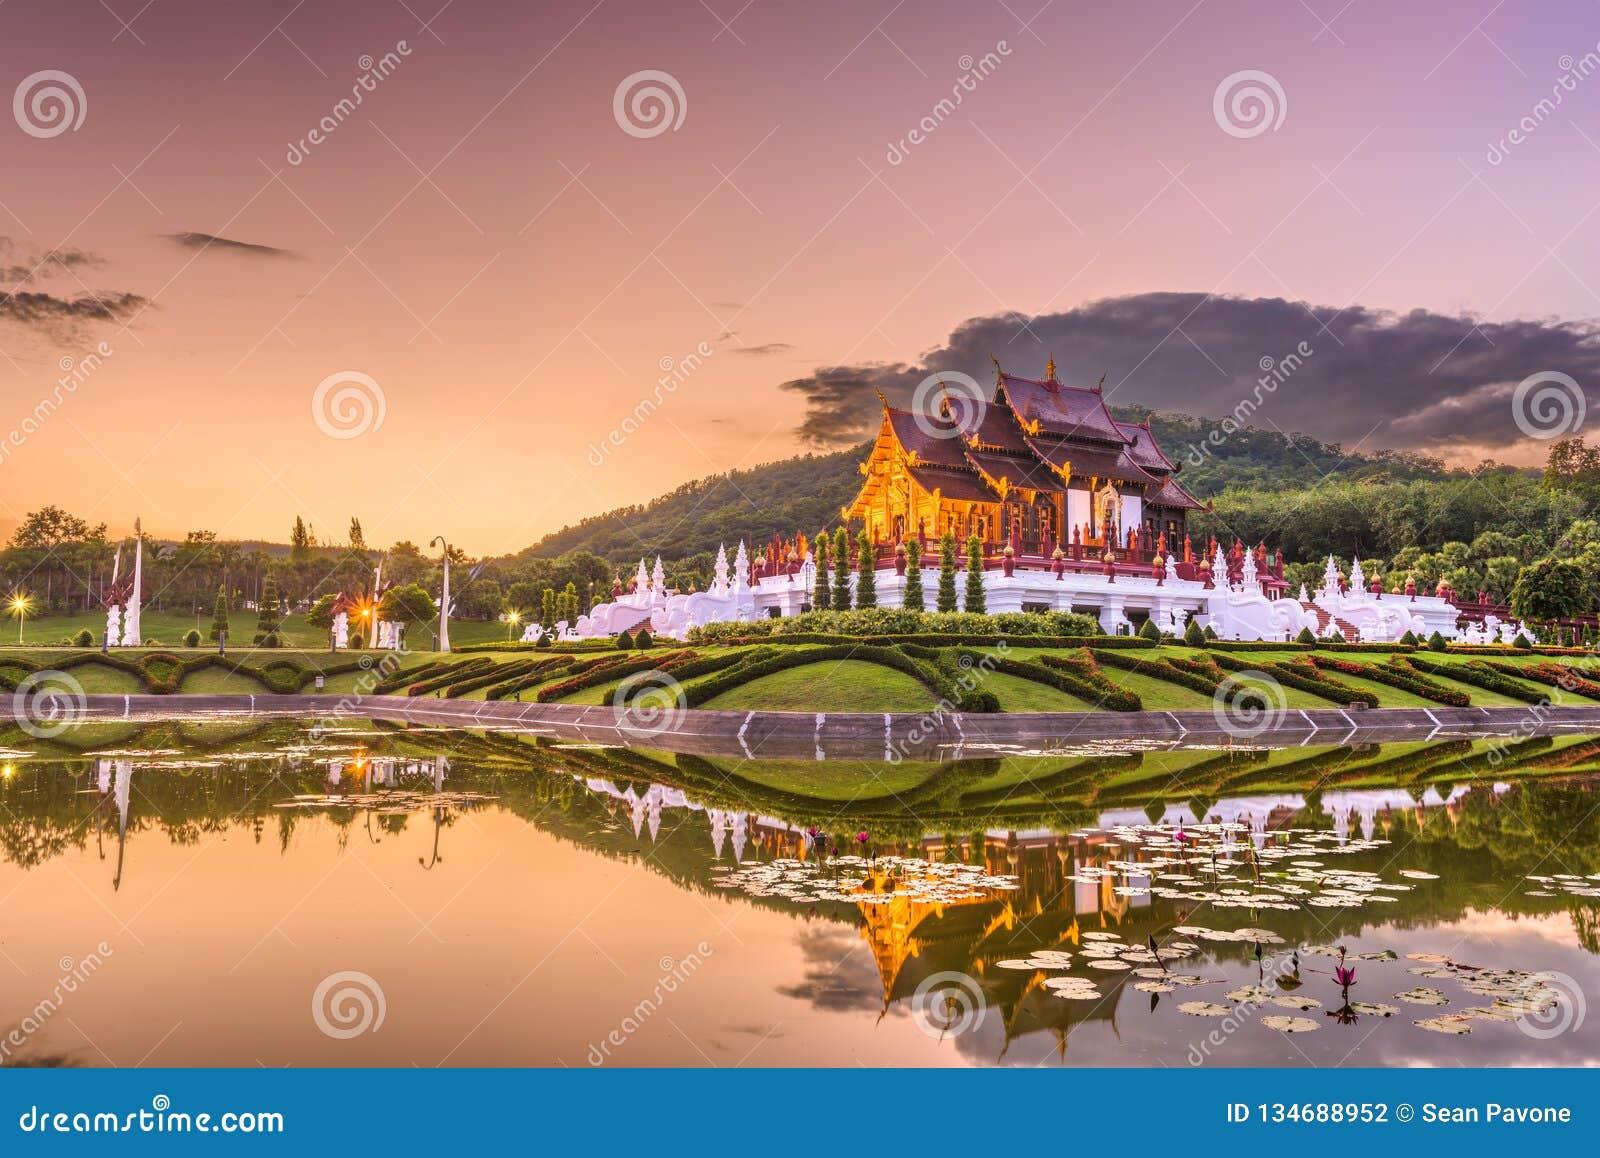 Чиангмай, парк Таиланда и павильон